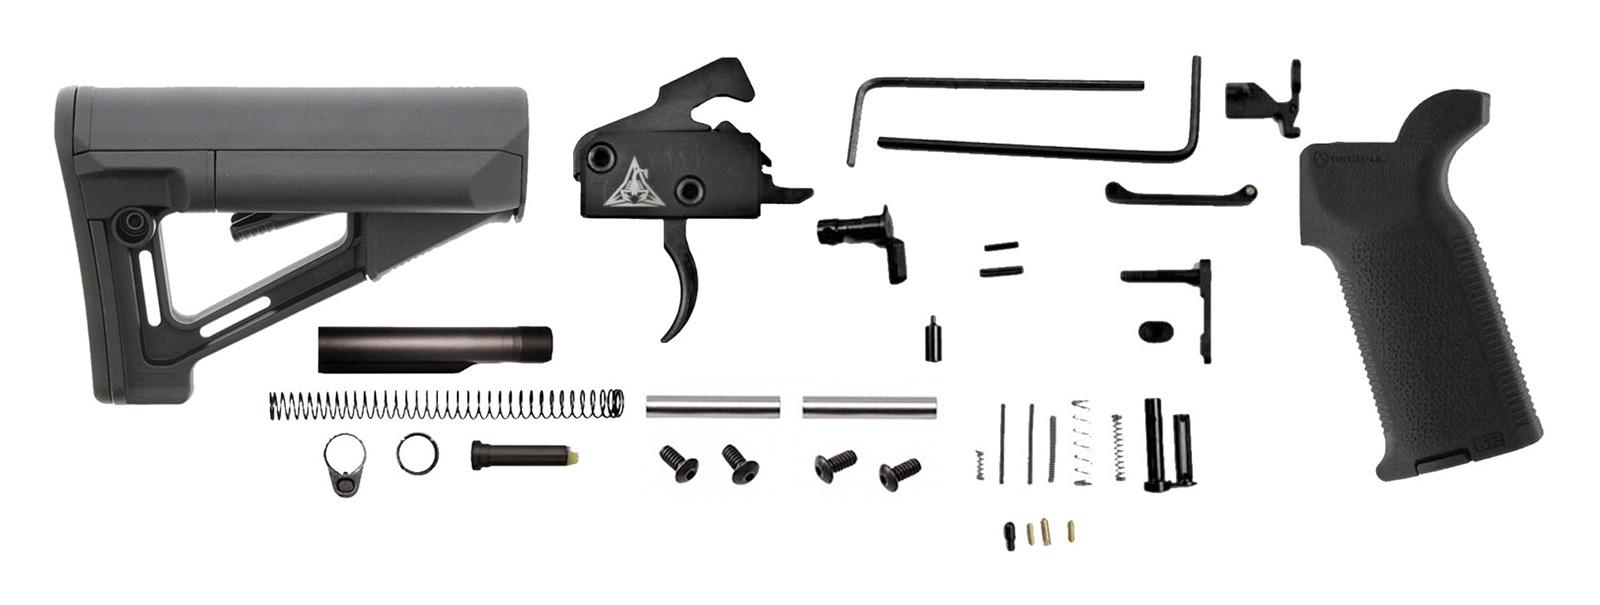 ar15-magpul-str-stock-rise-armament-sst-magpul-moe-k2-grip-antiwalk-pin-lpk-905231